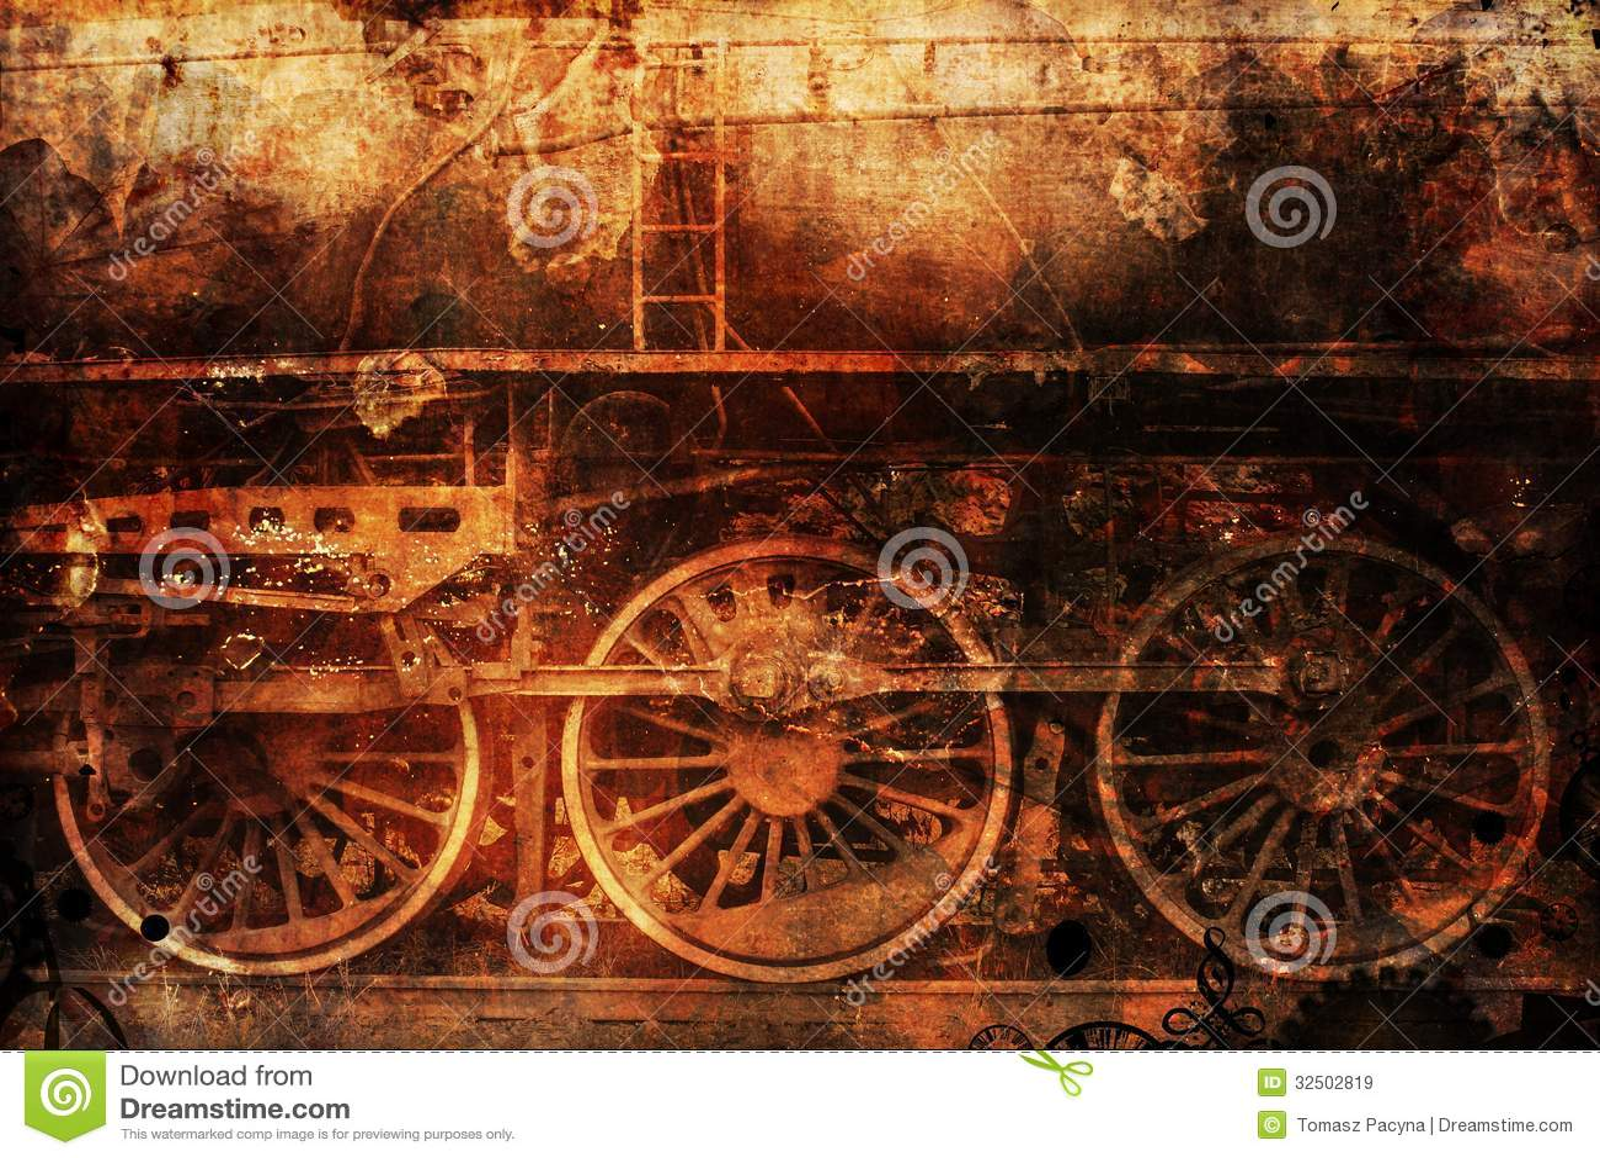 Rusty train industrial steam-punk background